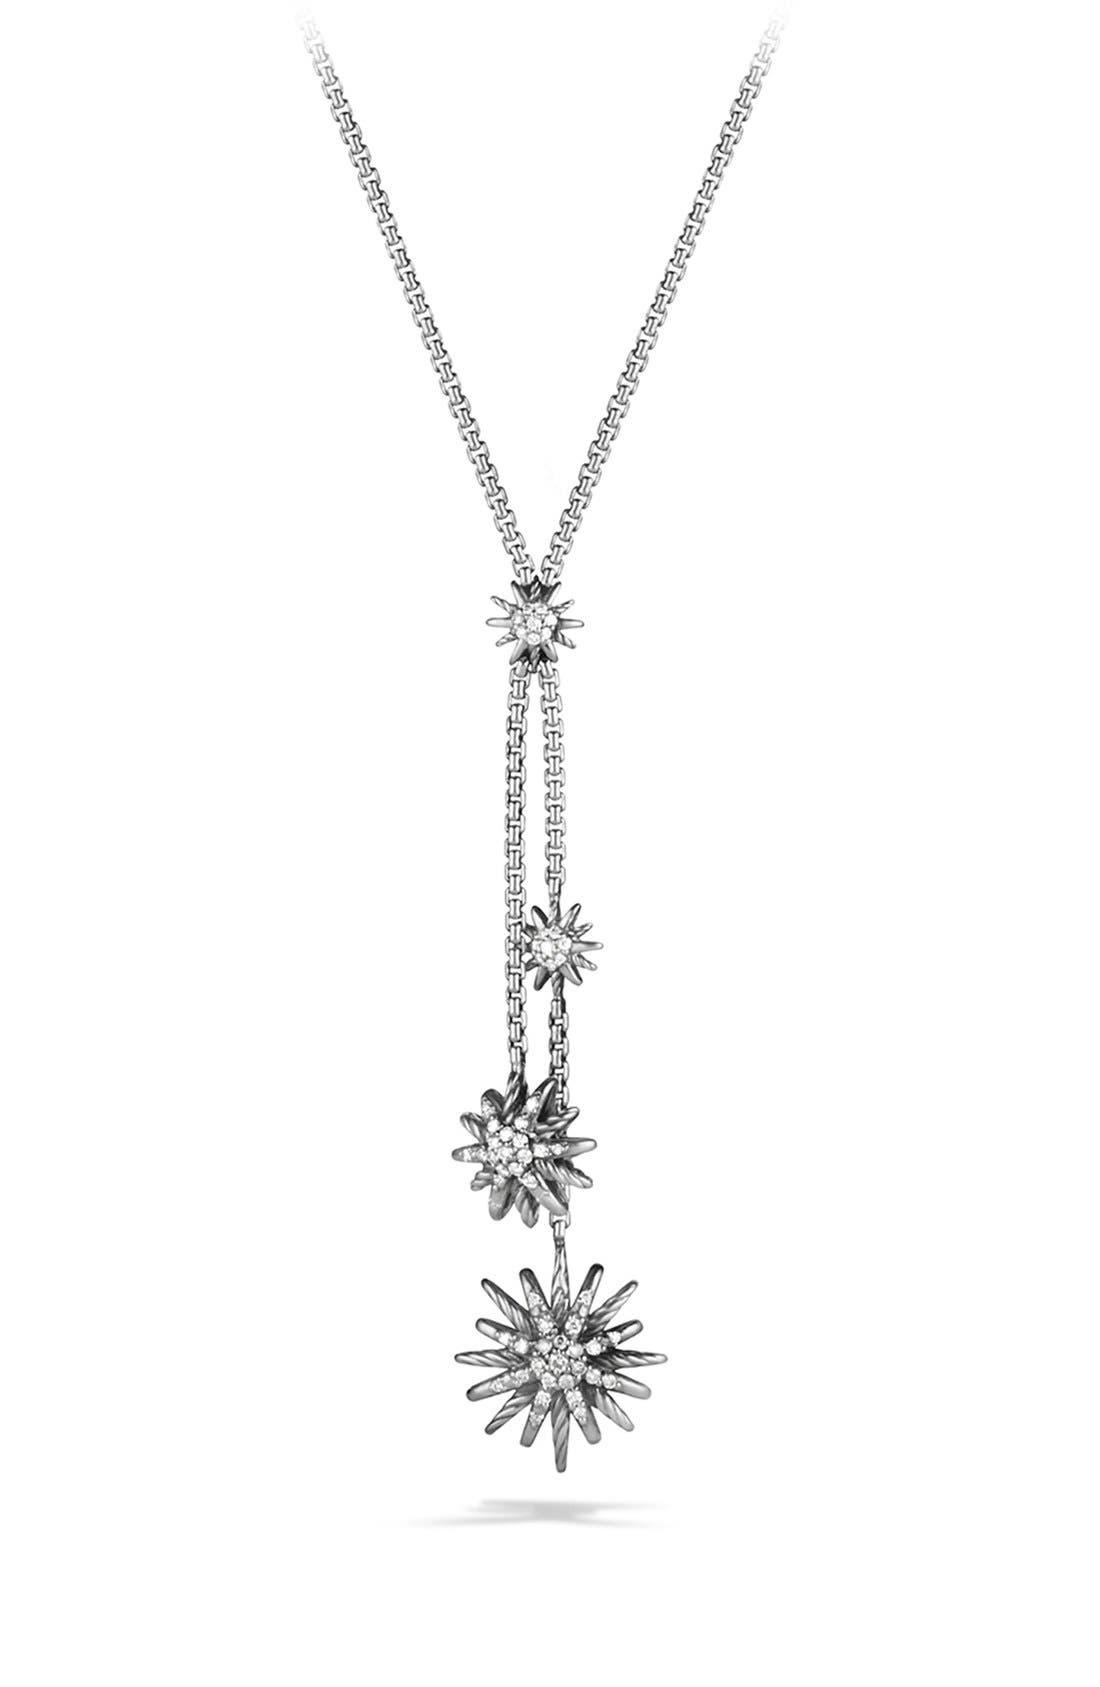 Alternate Image 1 Selected - David Yurman 'Starburst' Y Necklace with Diamonds